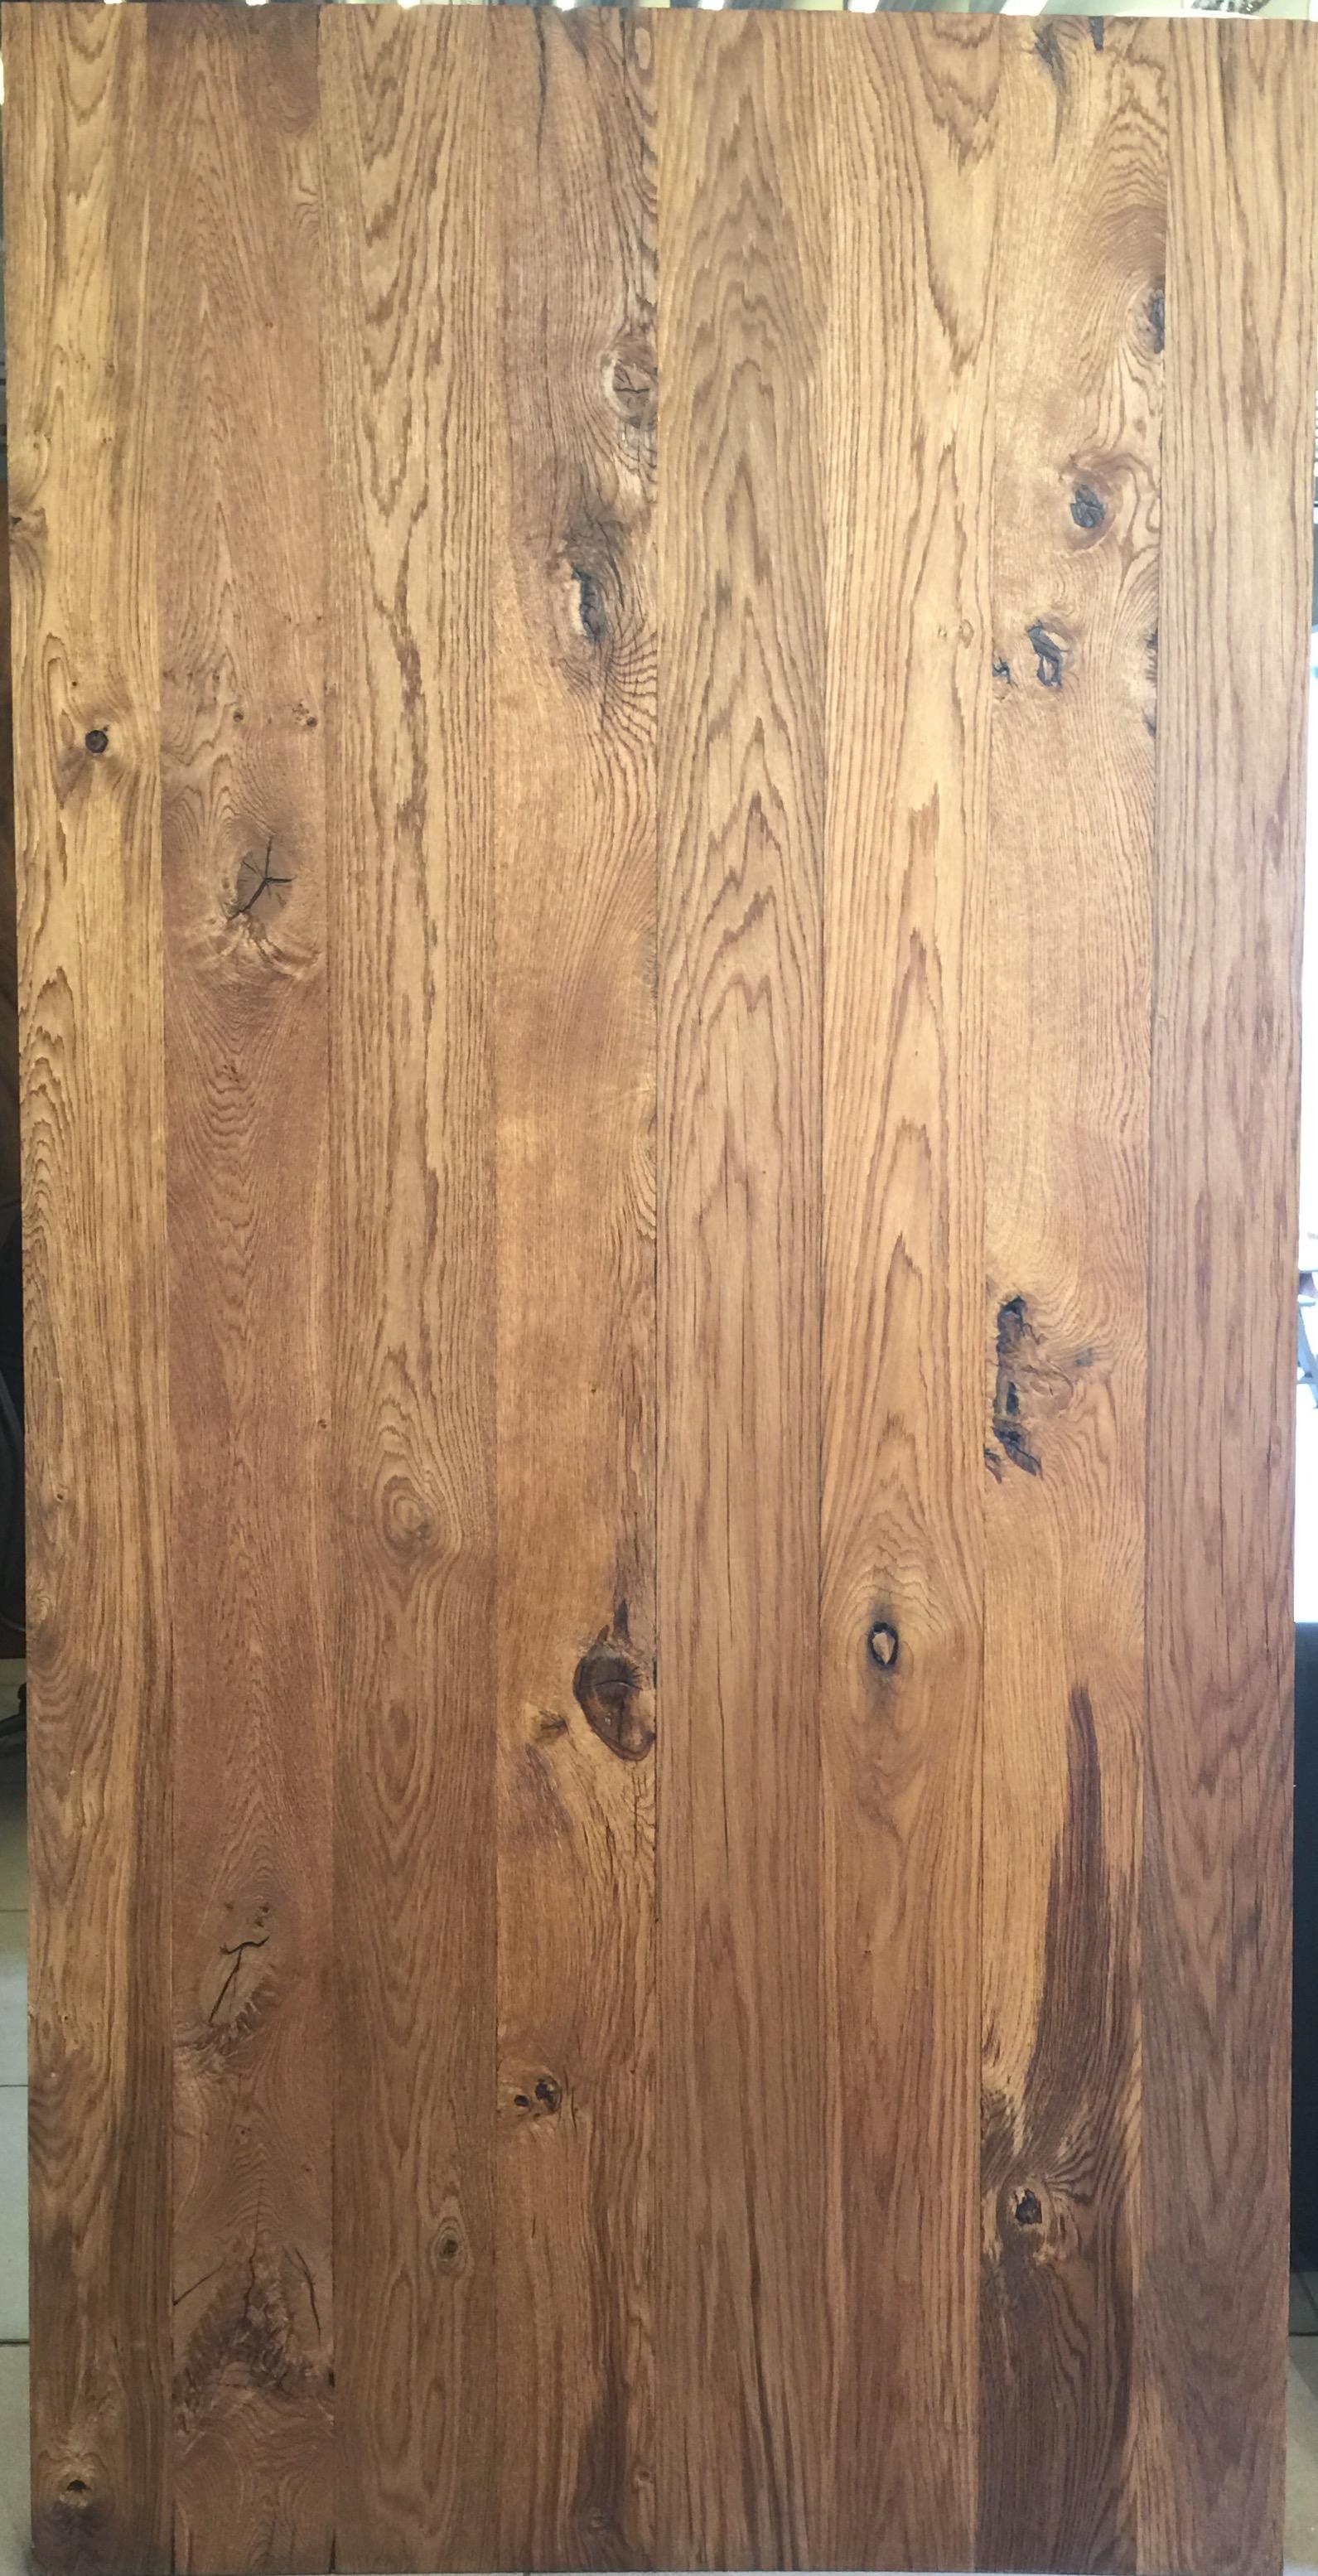 Thick Open Grain European Boughed Oak